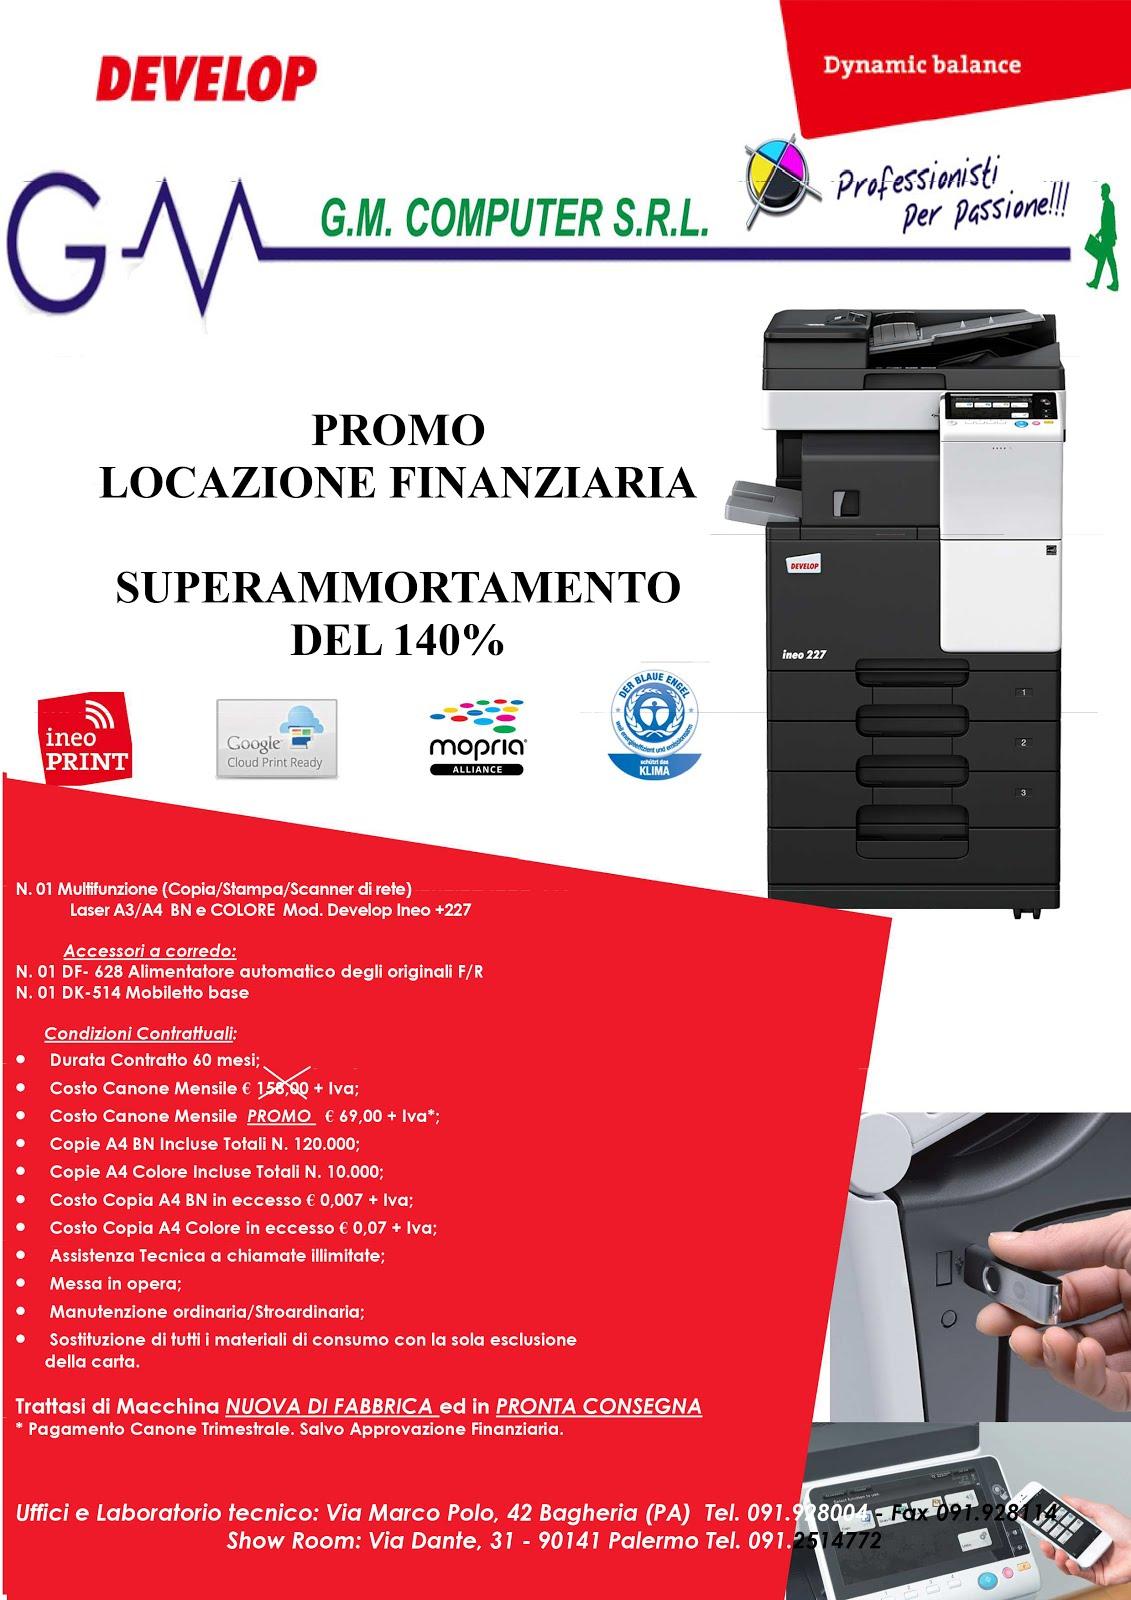 G.M. COMPUTER S.r..l.